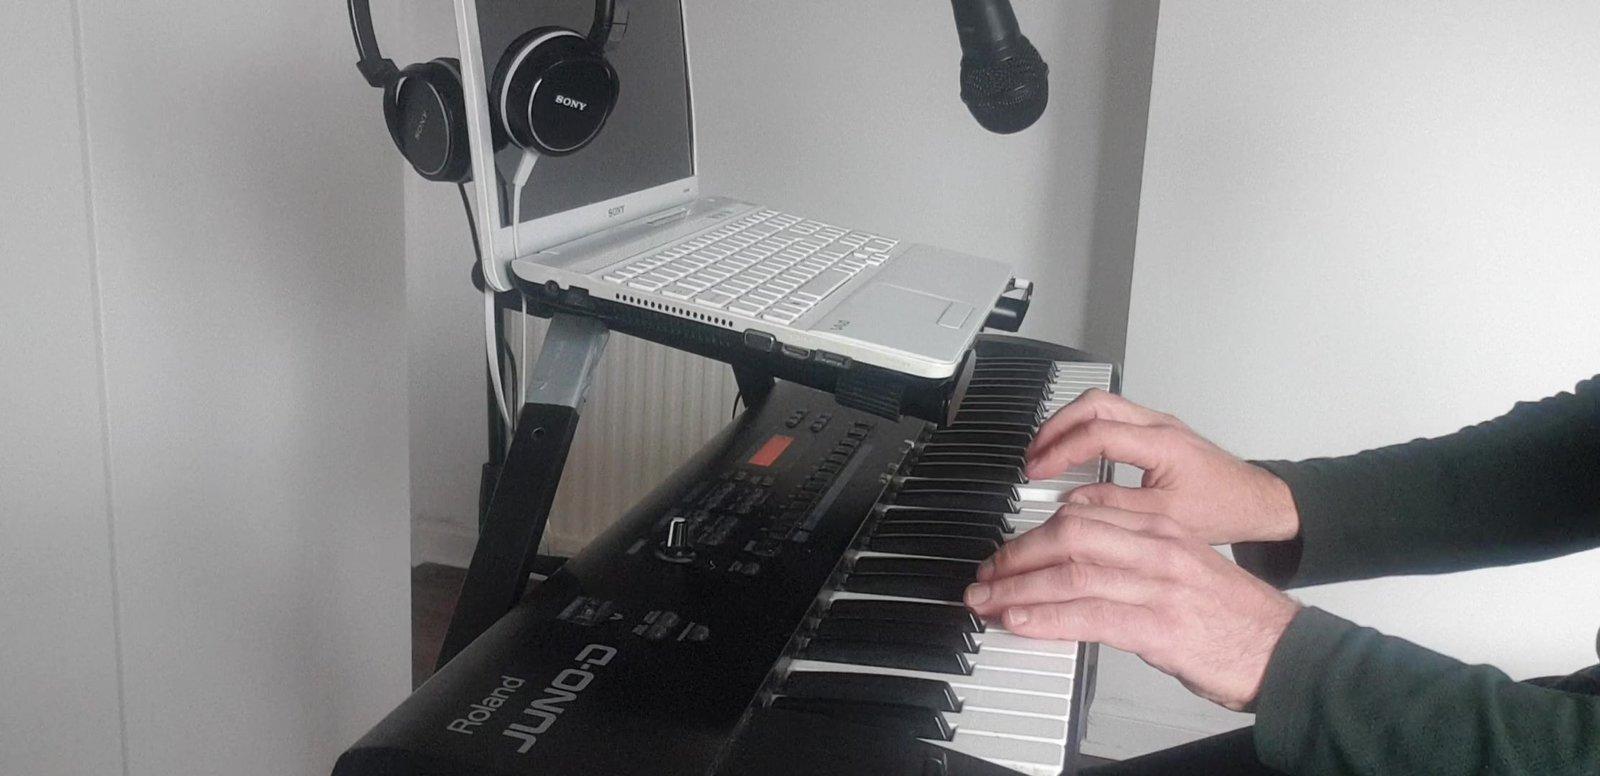 17..CLIP 17 keyboard clip 17_Moment.jpg